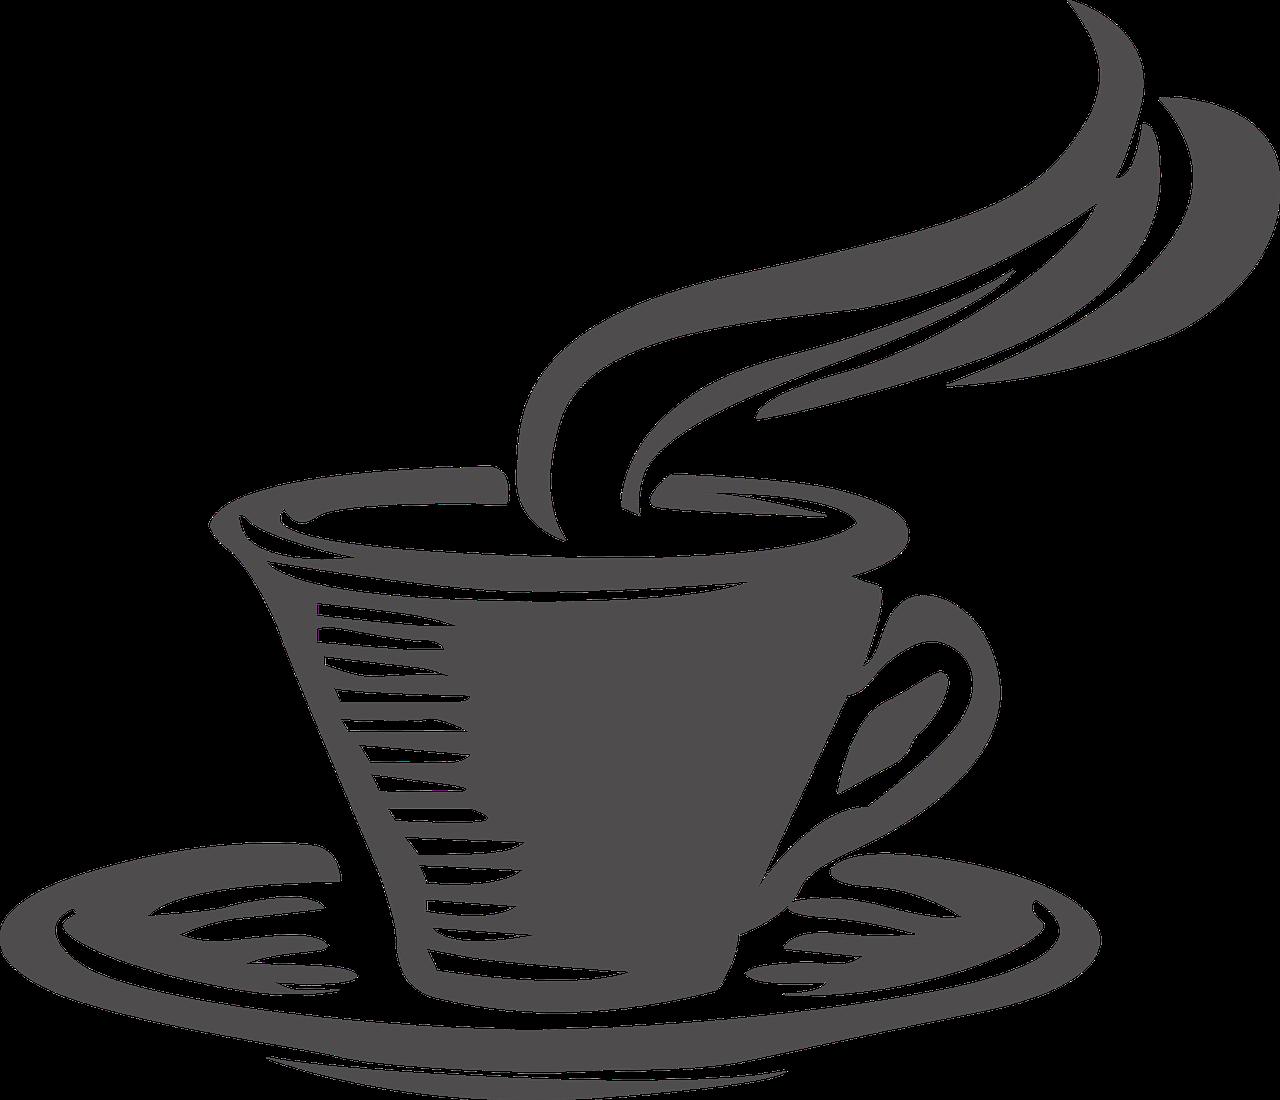 Hot clipart cup joe. Coffee bar cafe c